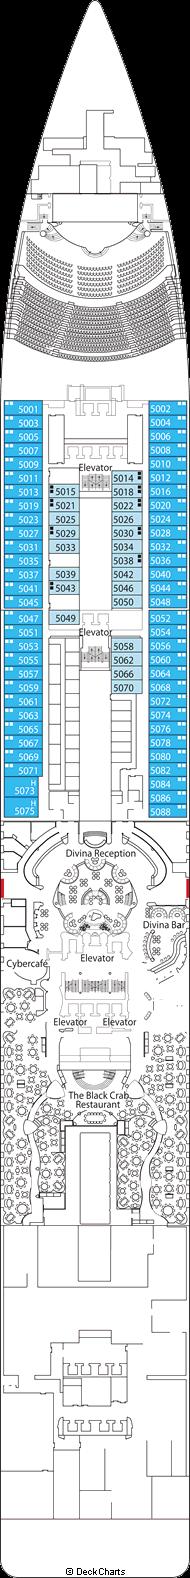 MSC Divina: Saturno Deck